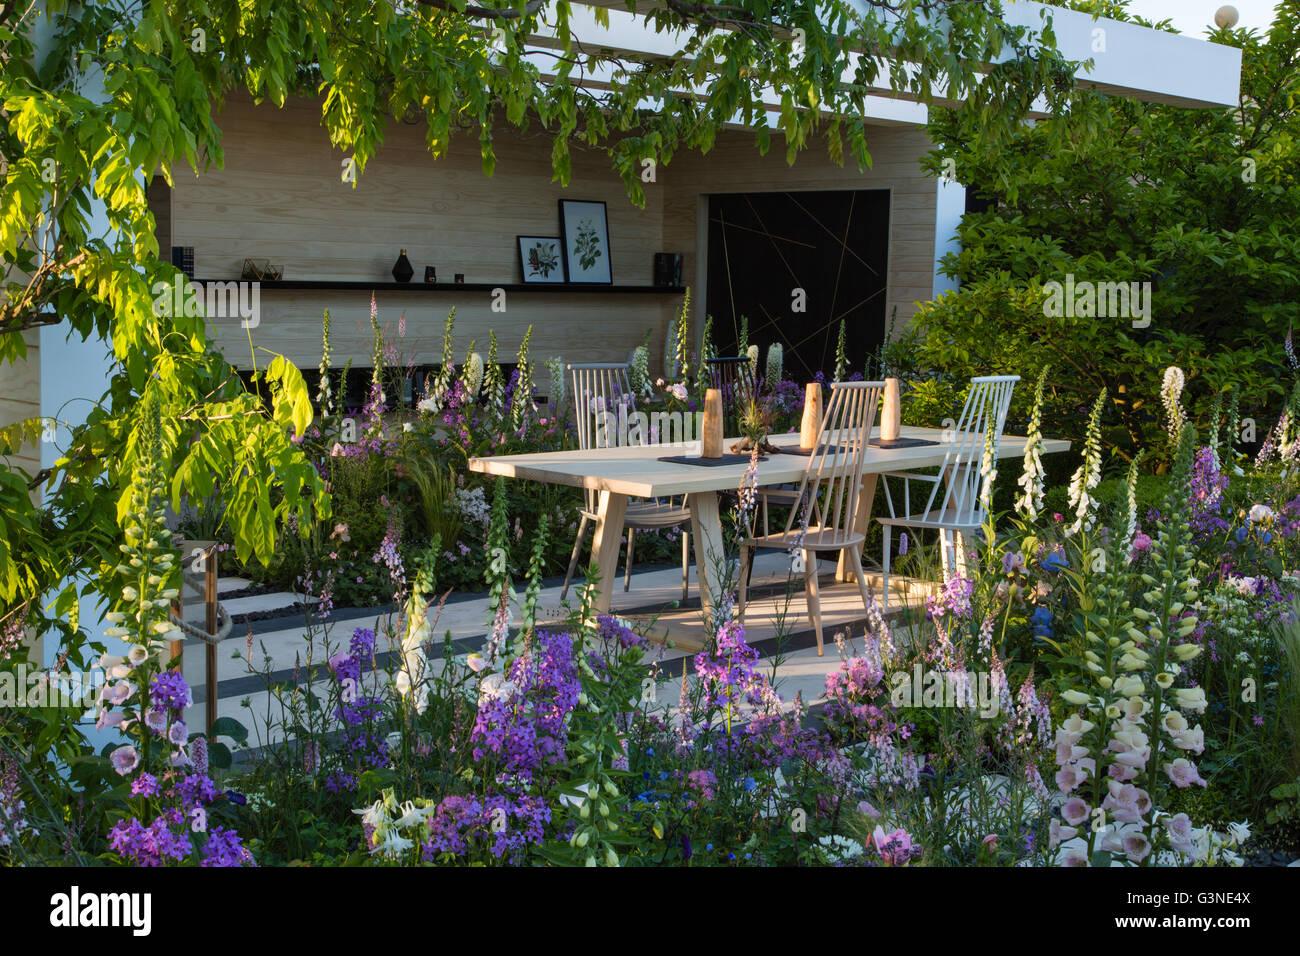 rhs chelsea 2016 lg smart garden hay joung hwang. Black Bedroom Furniture Sets. Home Design Ideas